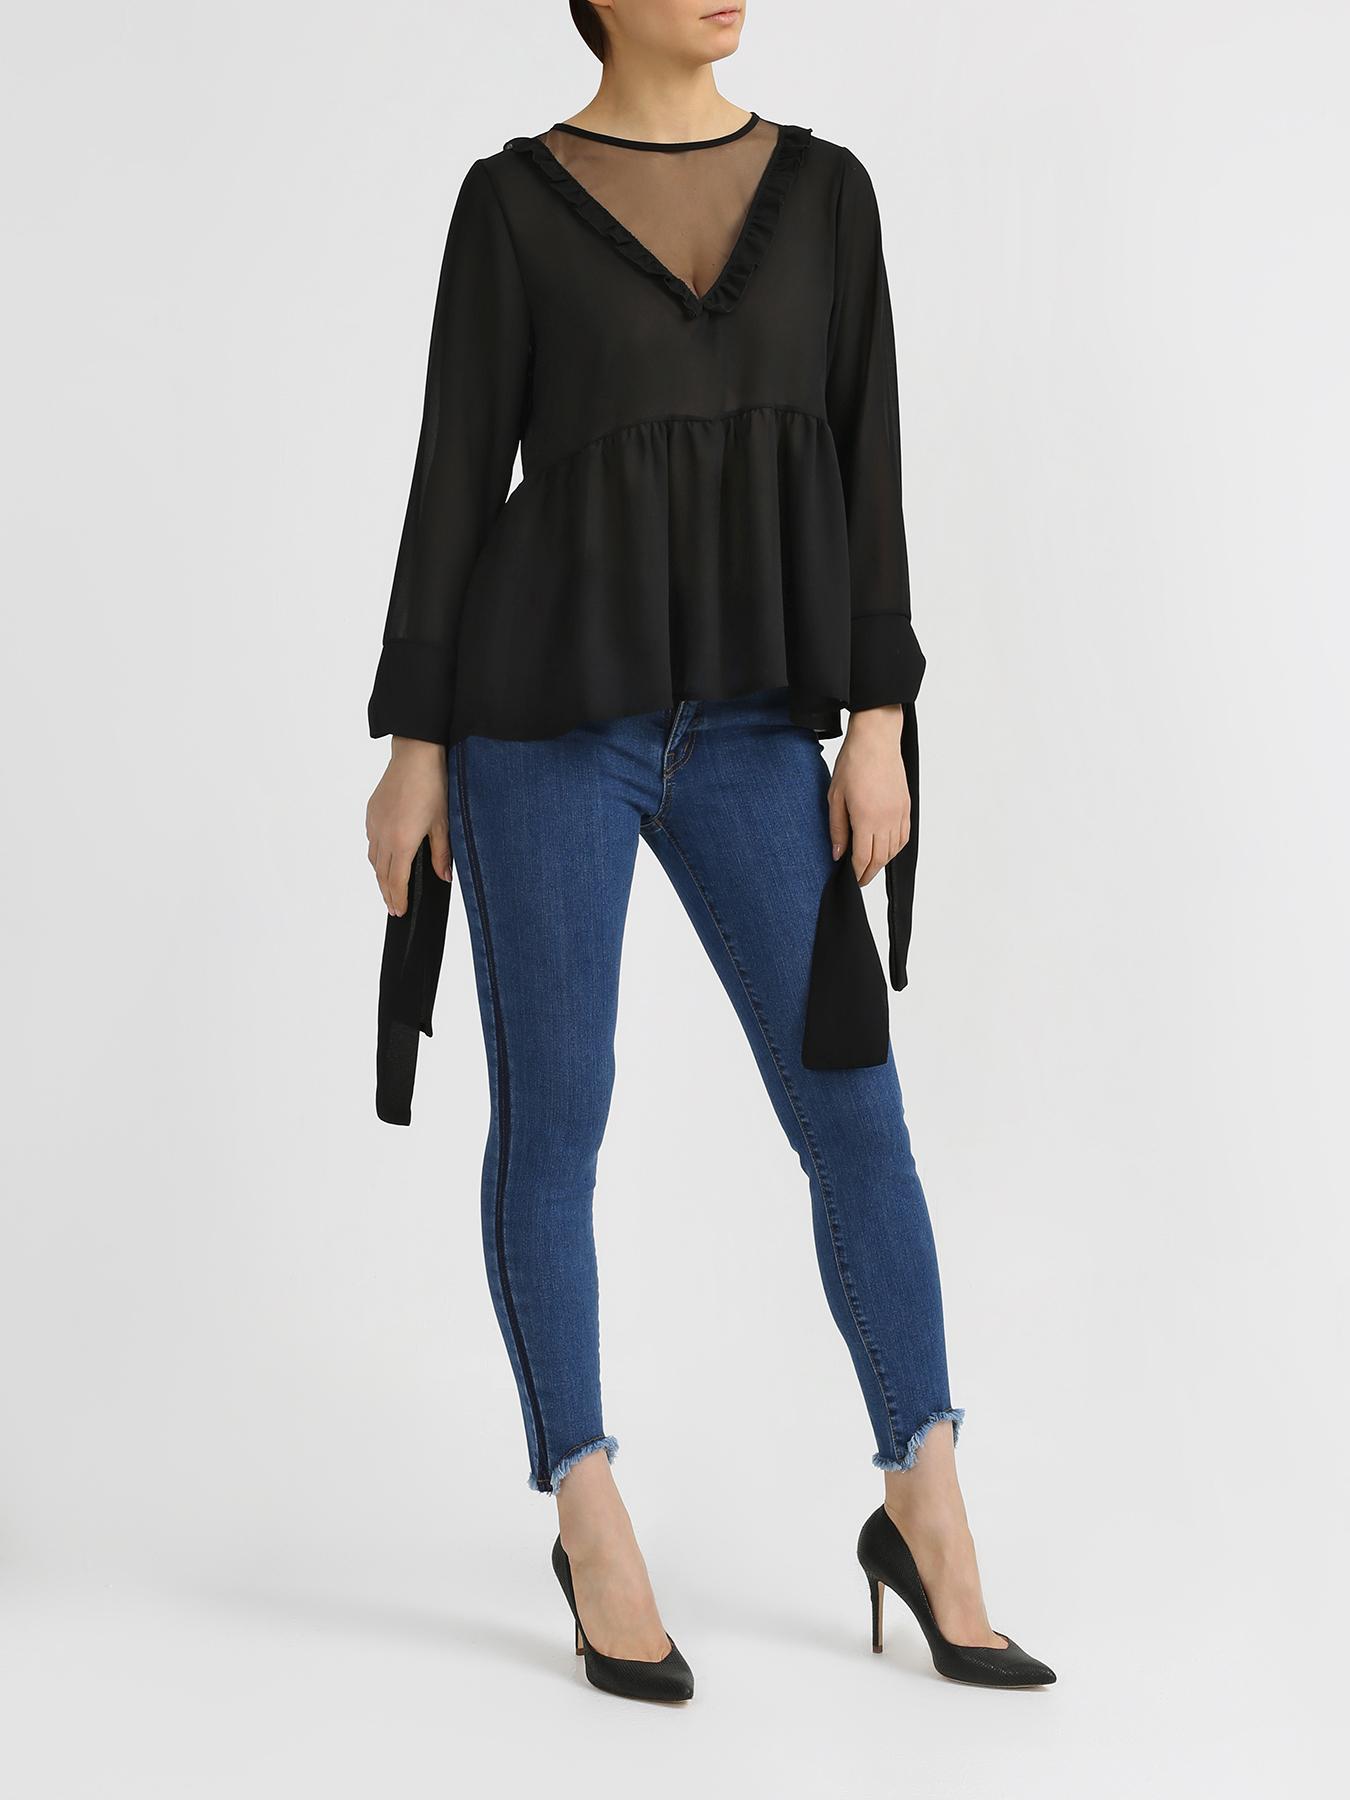 Блузка Rinascimento Блузка с вырезом блузка lime блузка с завязками